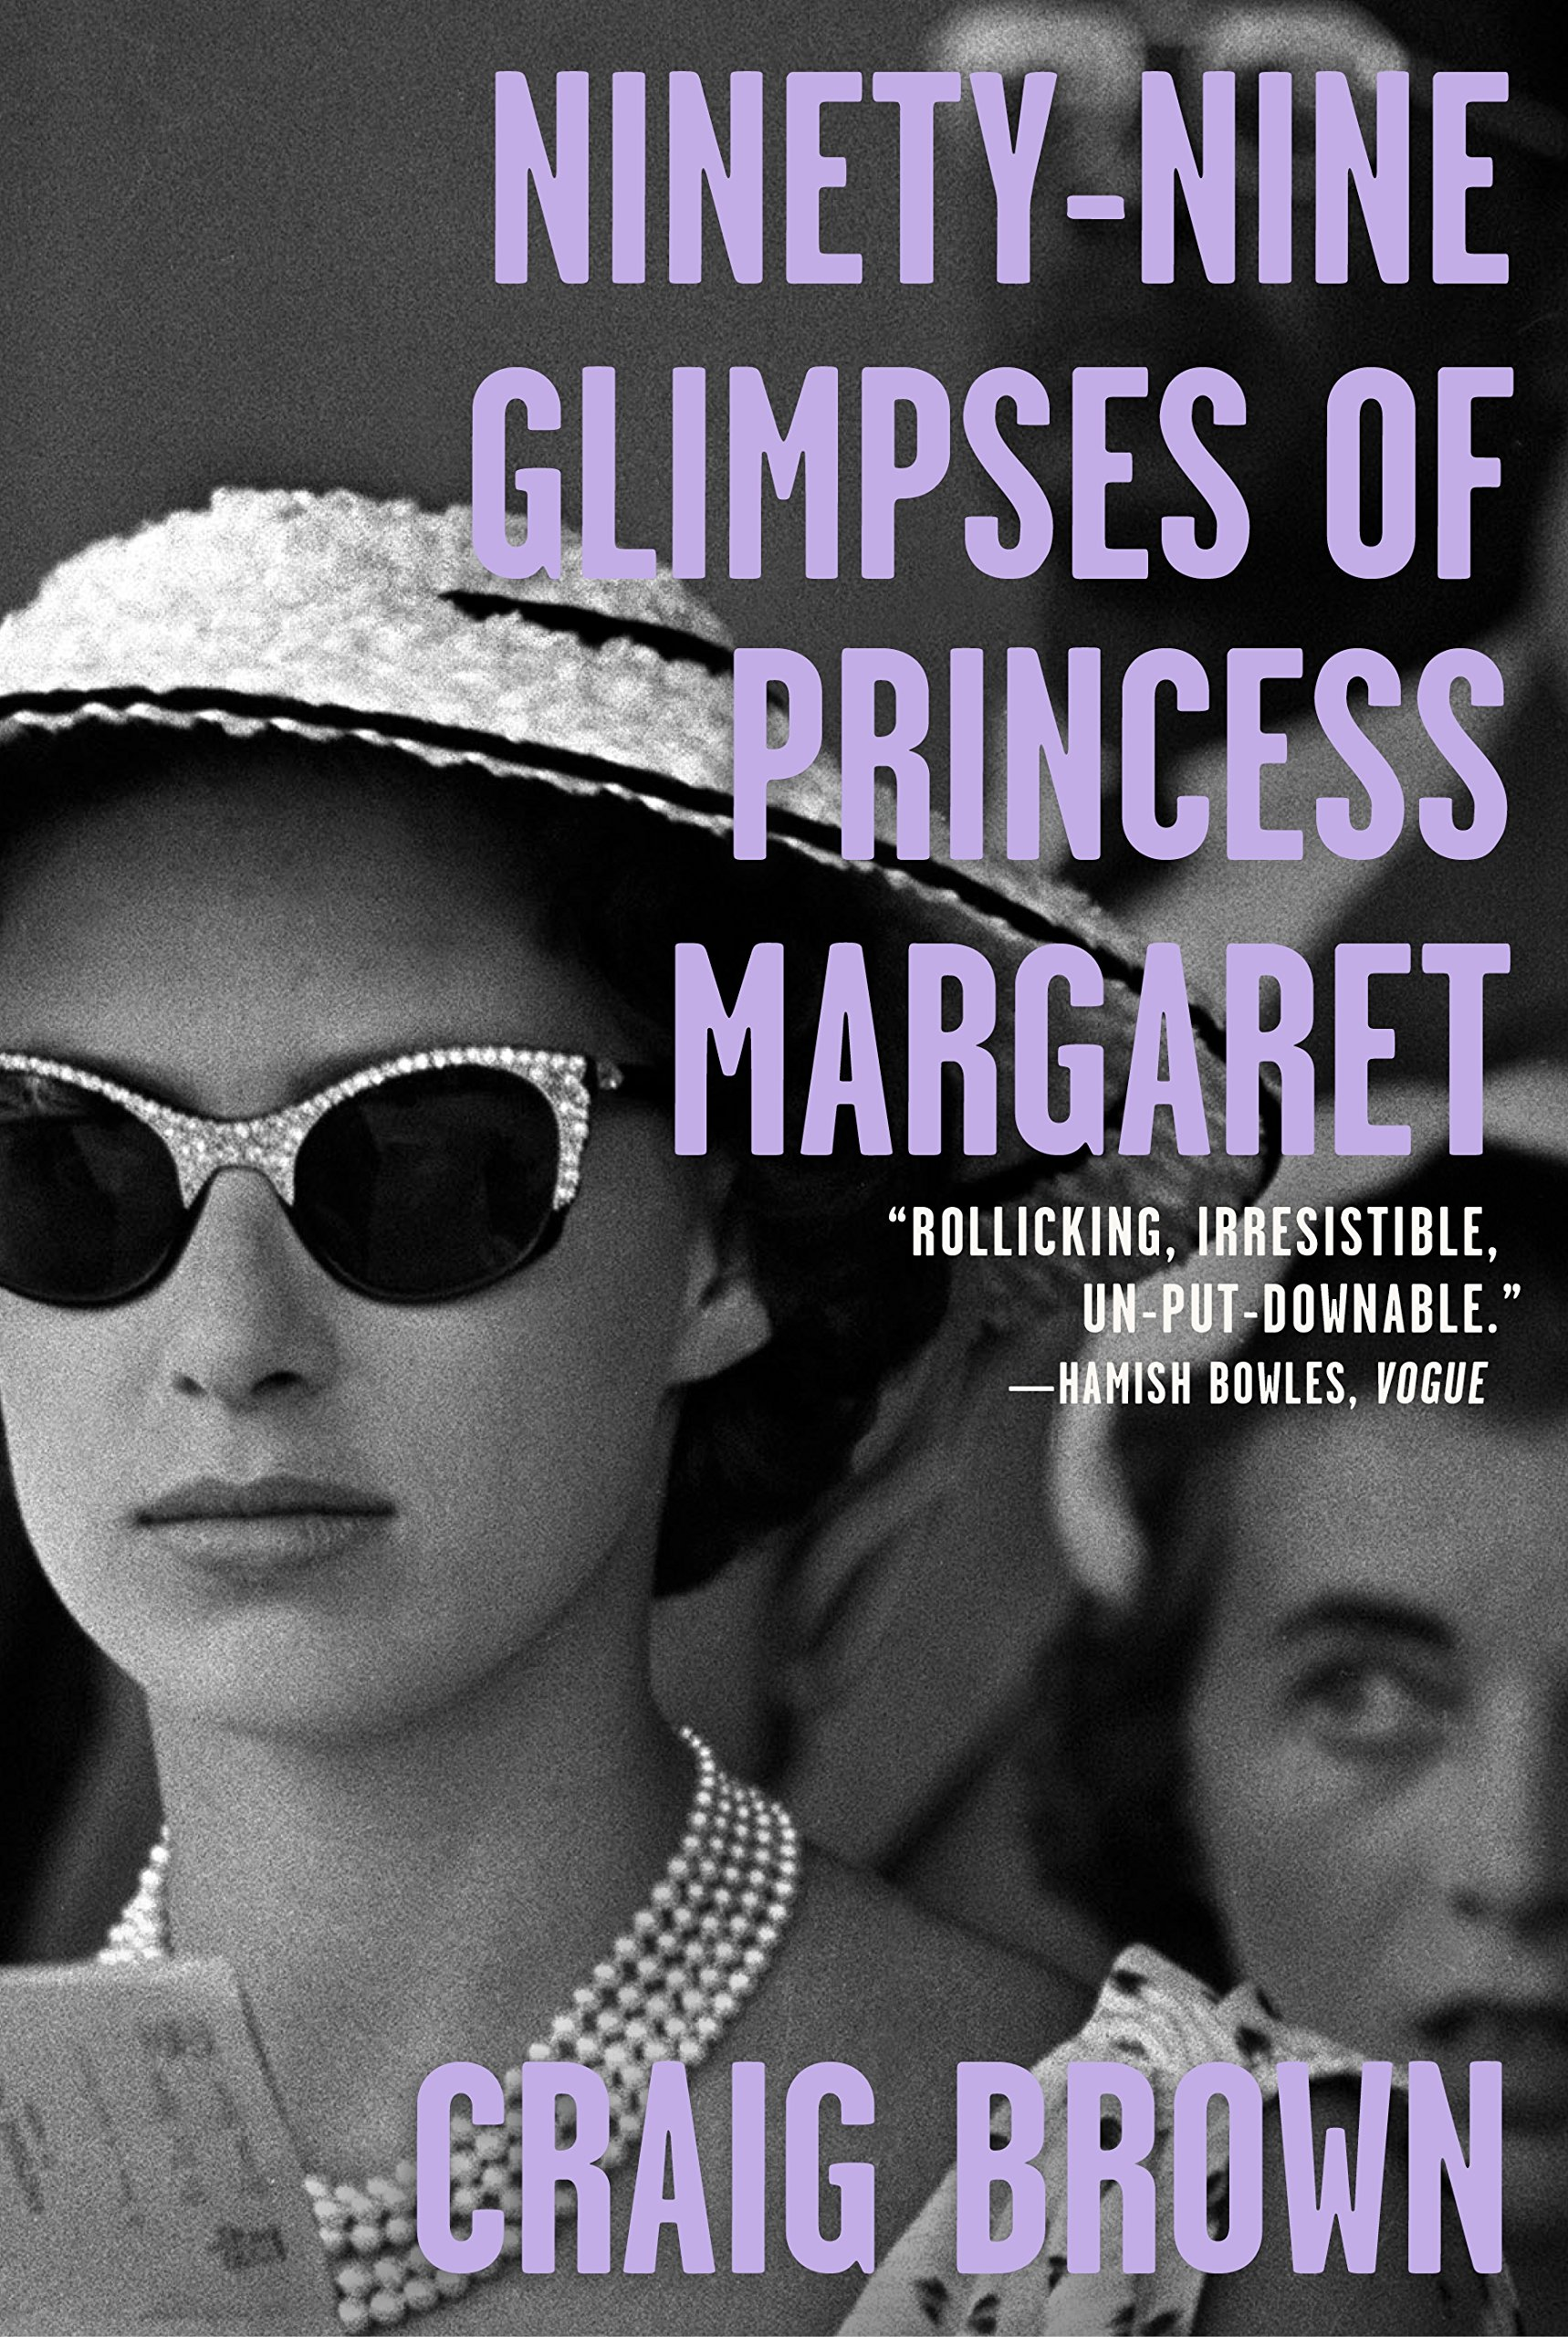 Ninety-Nine Glimpses of Princess Margaret: Brown, Craig: 9780374906047: Amazon.com: Books